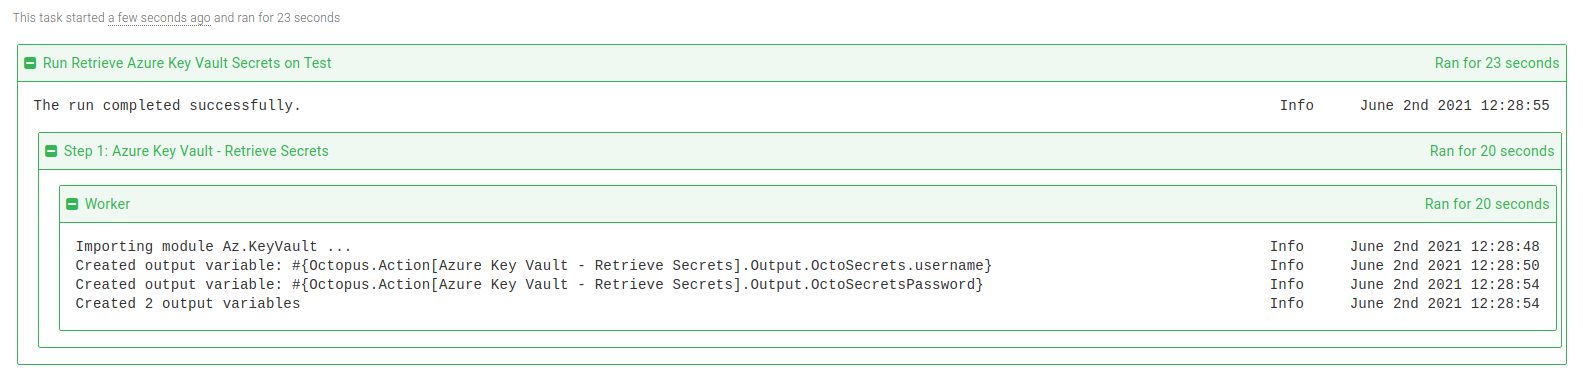 Azure Key Vault retrieve secrets step task log